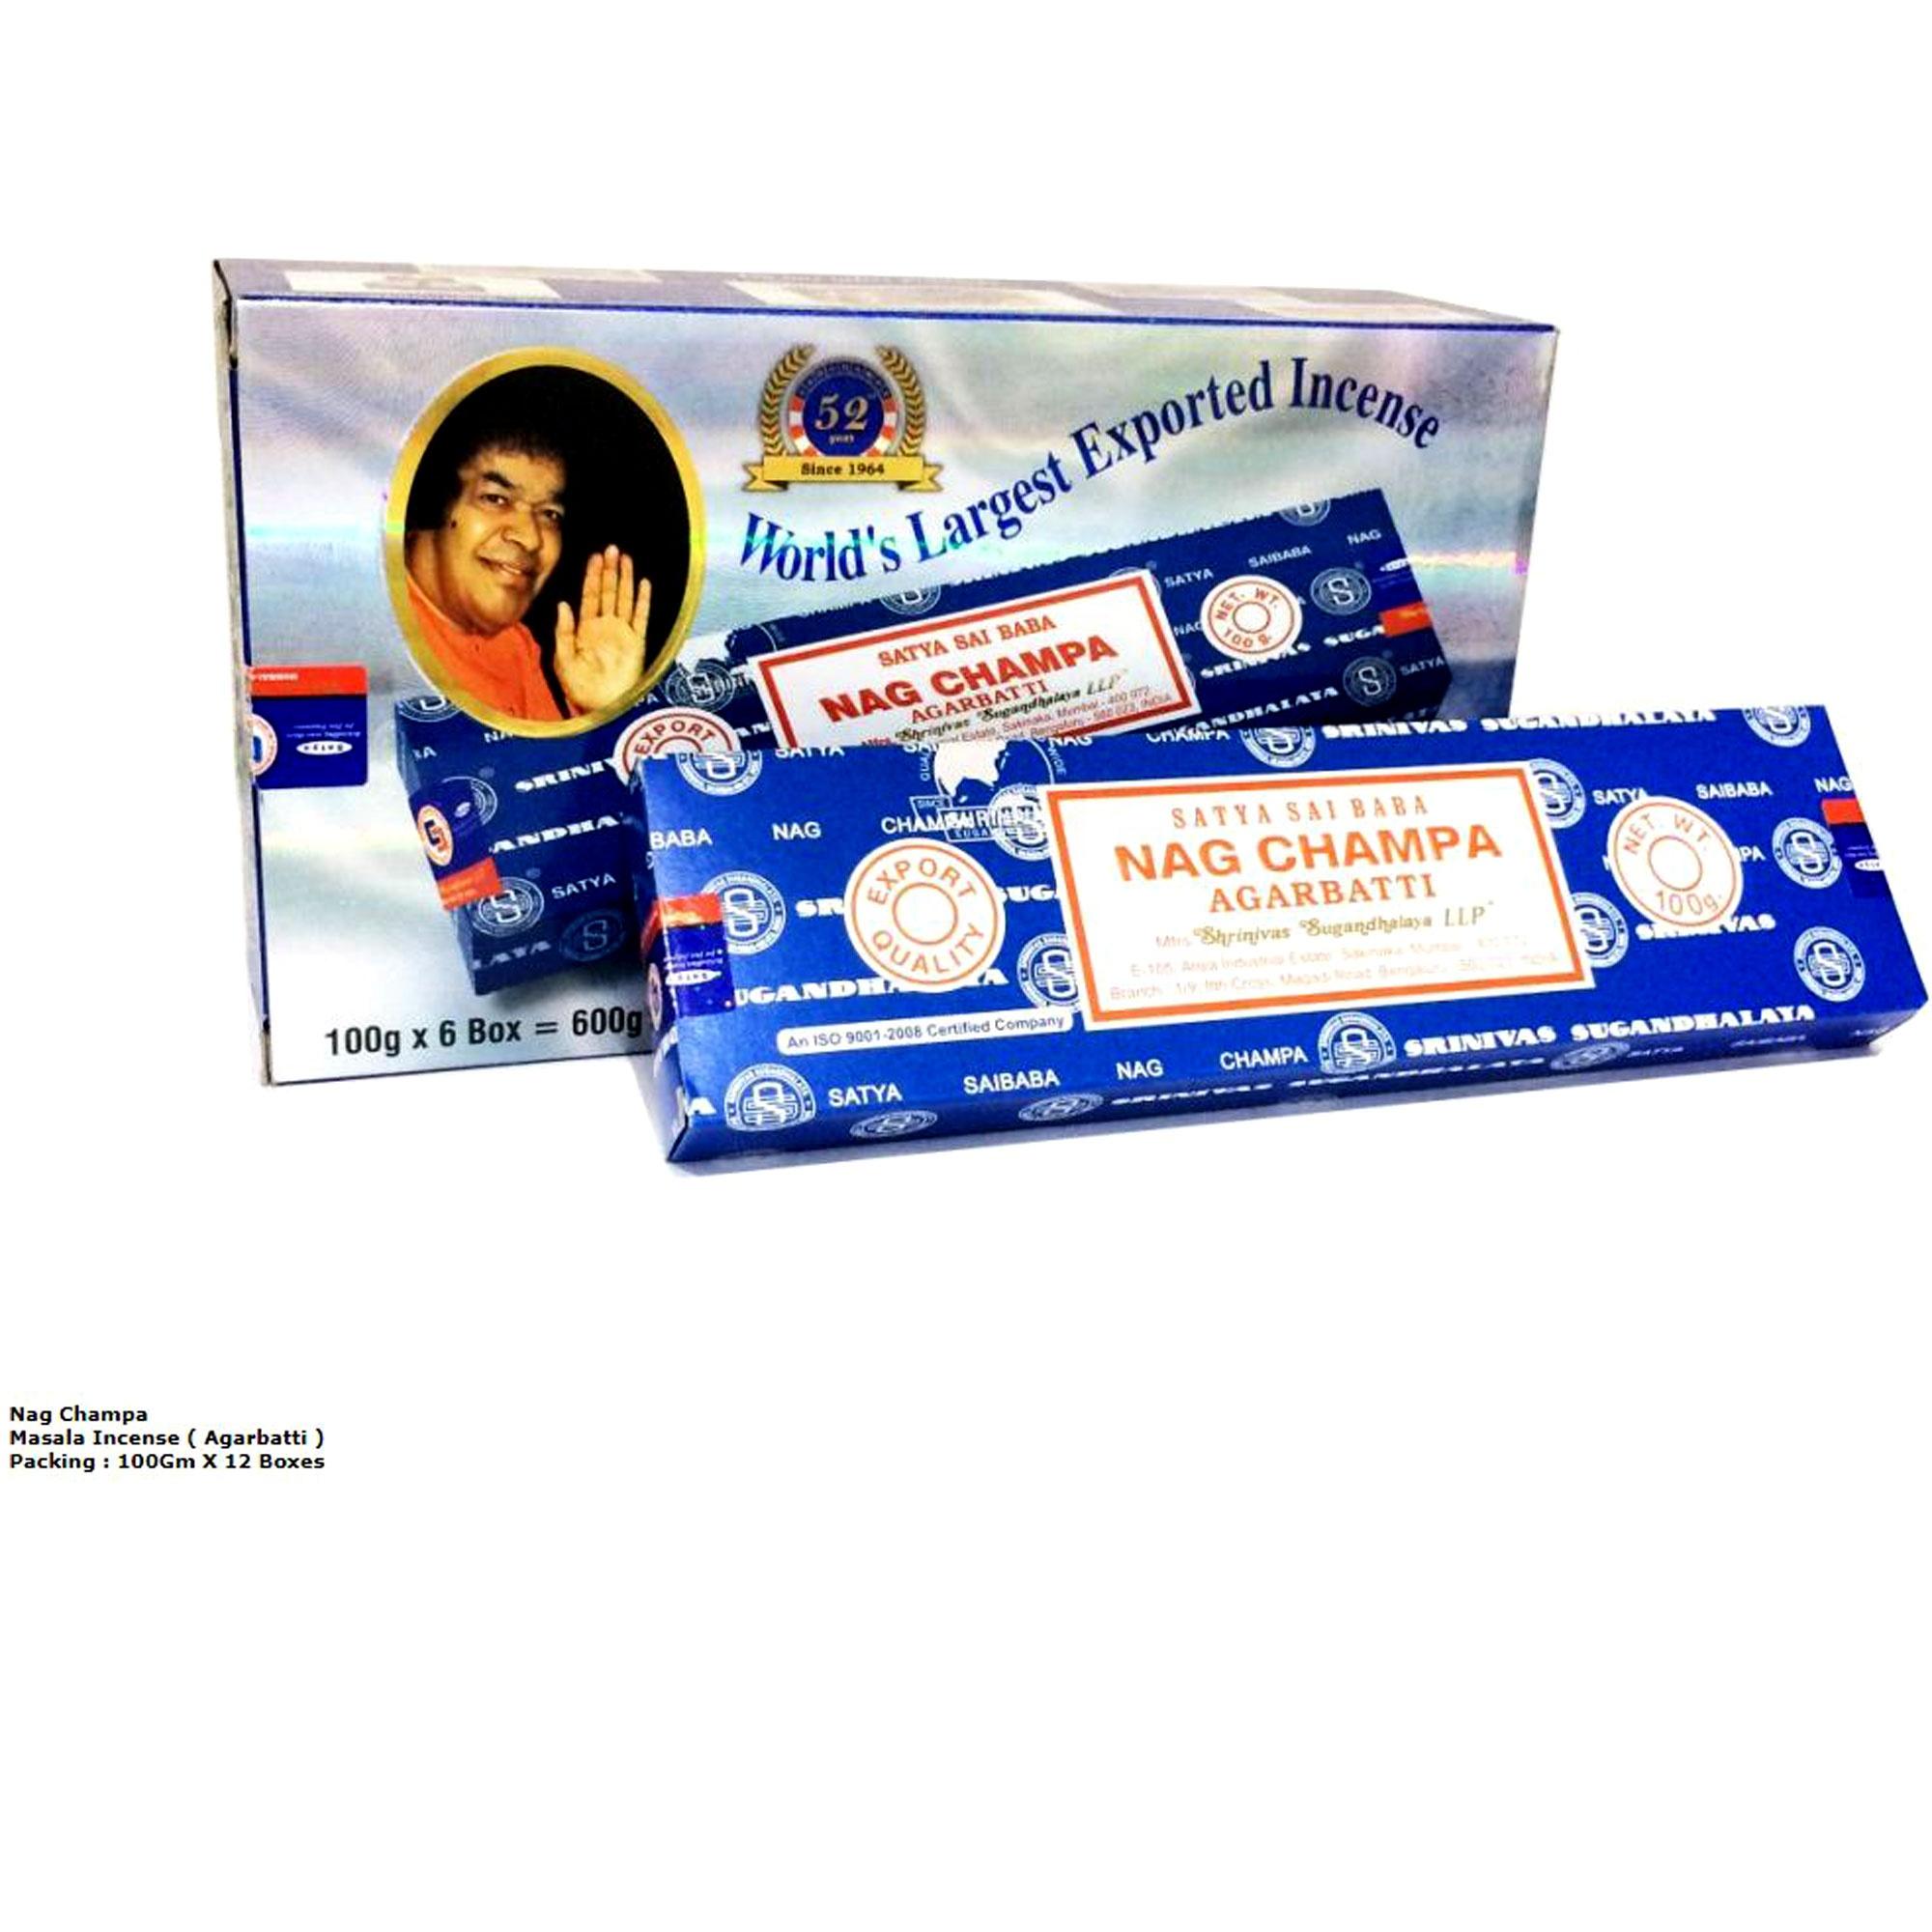 Duft Aroma Scents Satya Original Certified Nag Champa Incense Sticks Hand Made In India 30 Mobel Wohnen Totum Ca